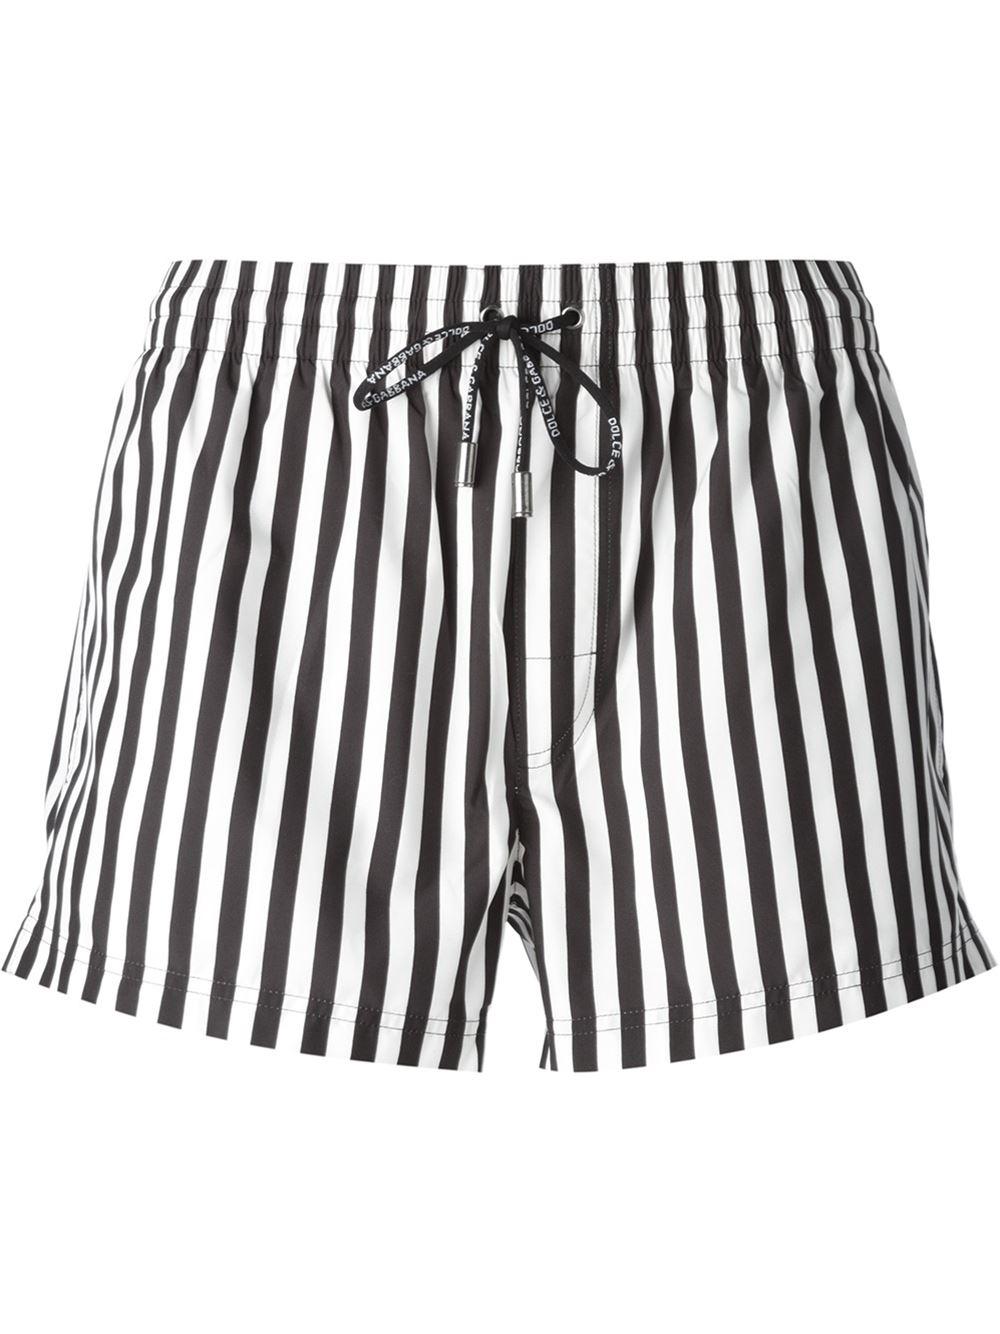 Dolce & gabbana Striped Swim Shorts in Black for Men | Lyst